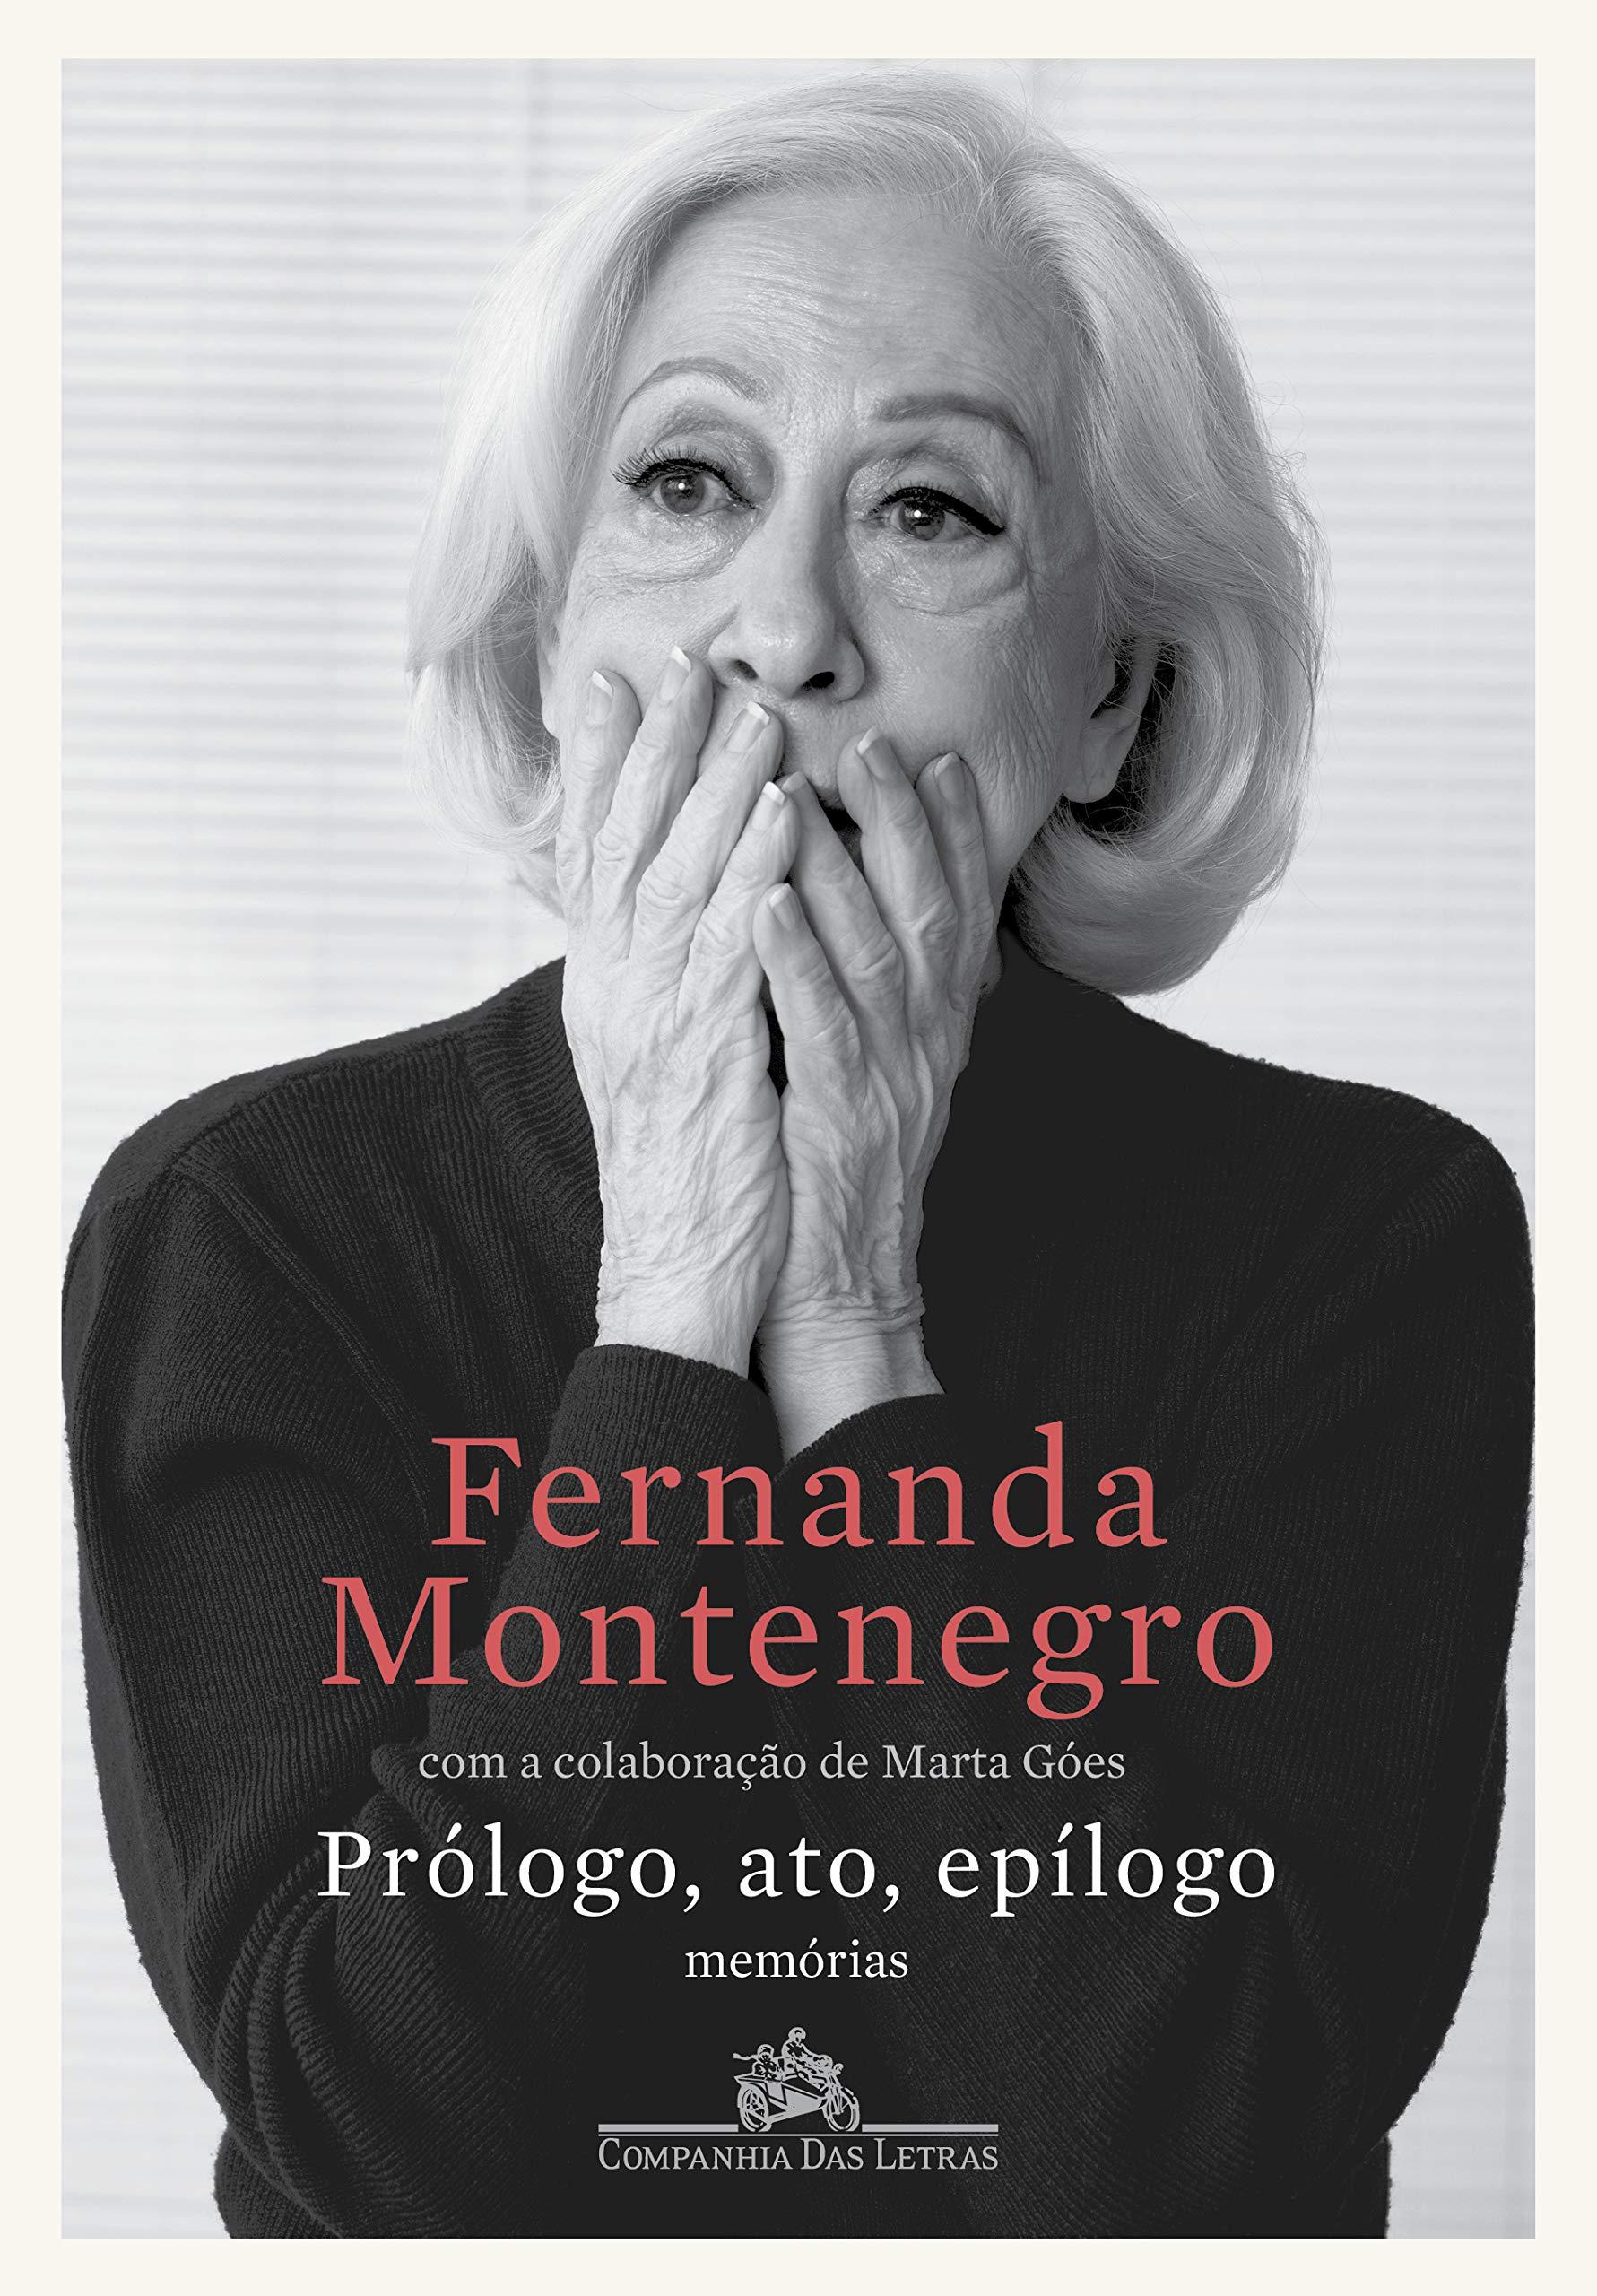 Livro de Fernanda Montenegro